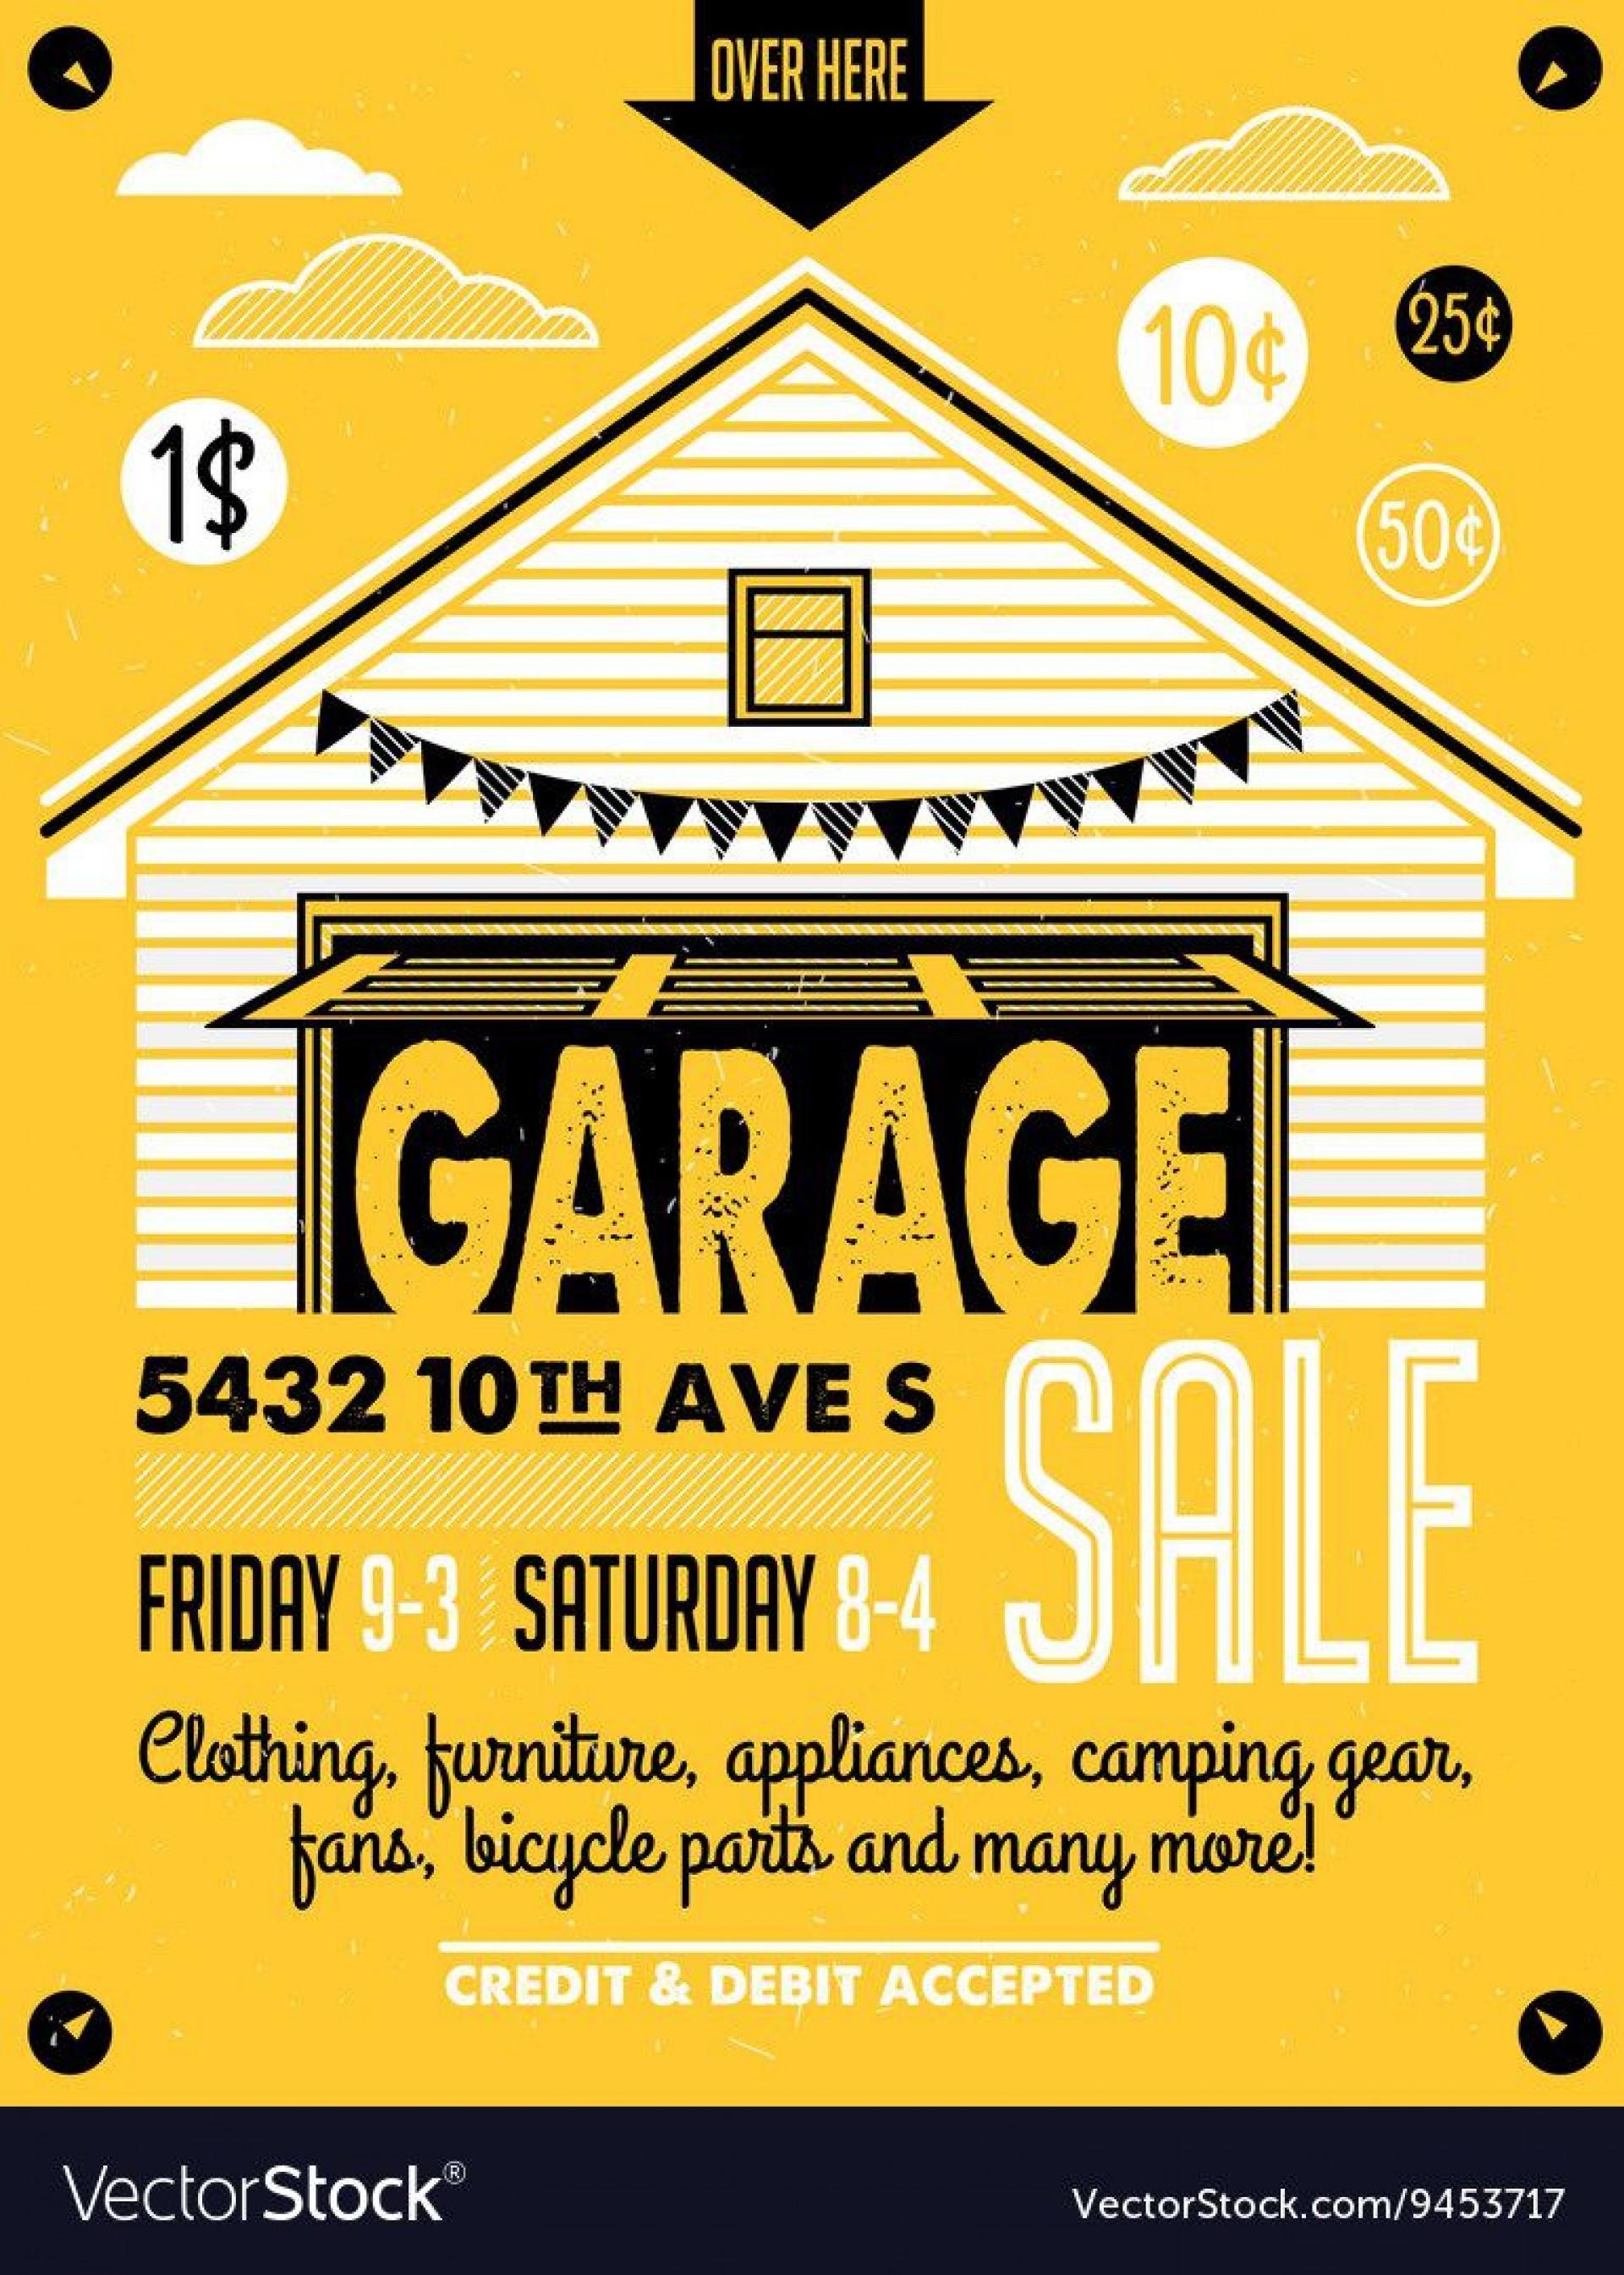 010 Impressive Garage Sale Flyer Template Free Concept  Community Neighborhood Yard1920